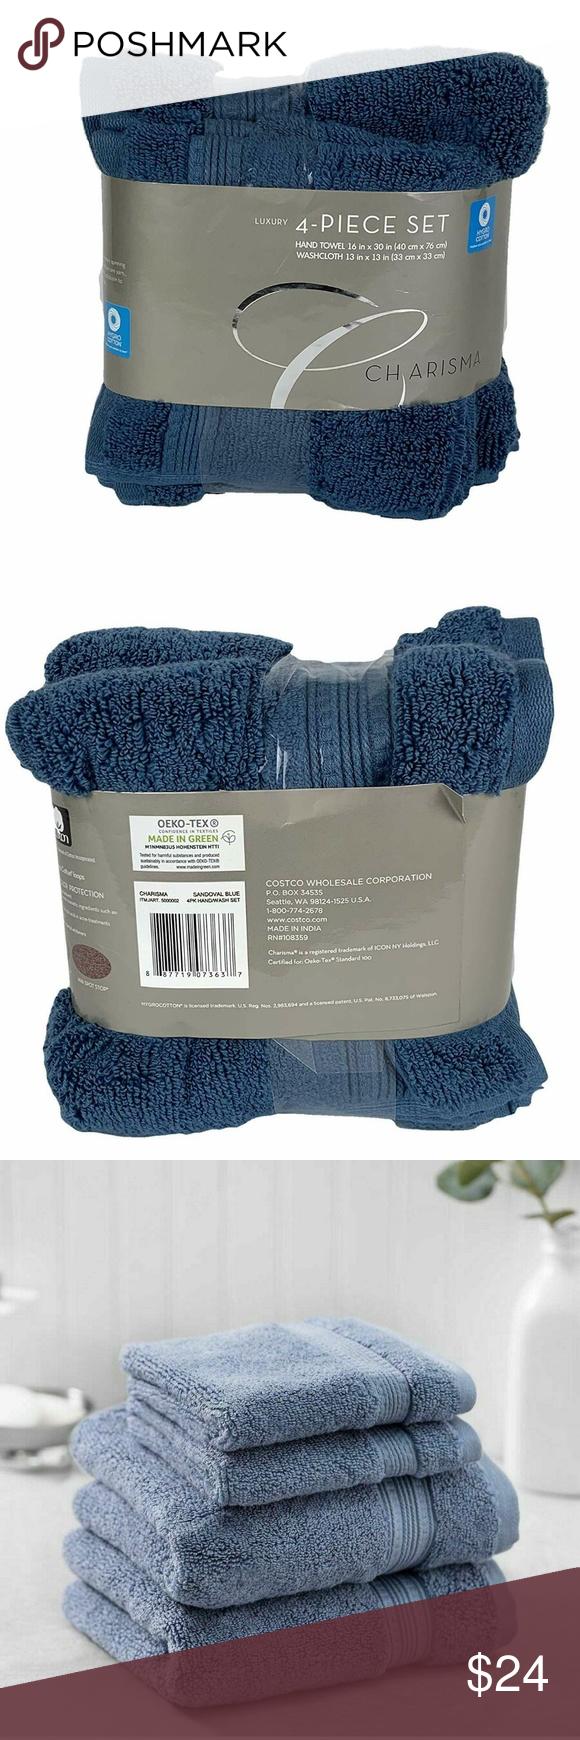 Charisma 100 Hygro Cotton 4 Piece Bath Towel Set Nwt Towel Set